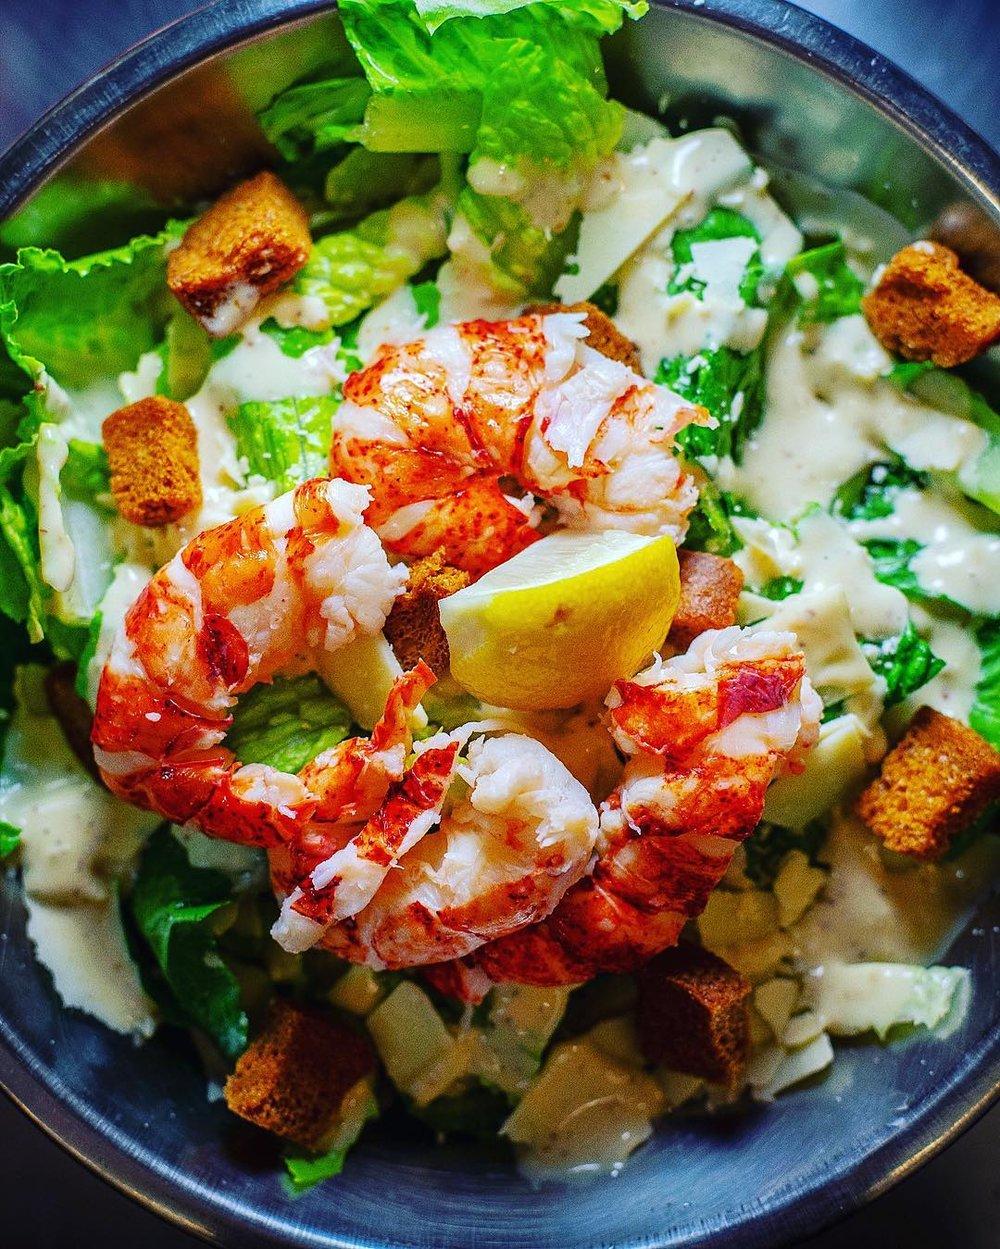 fresh shrimp with lemon wedge on leafy salad